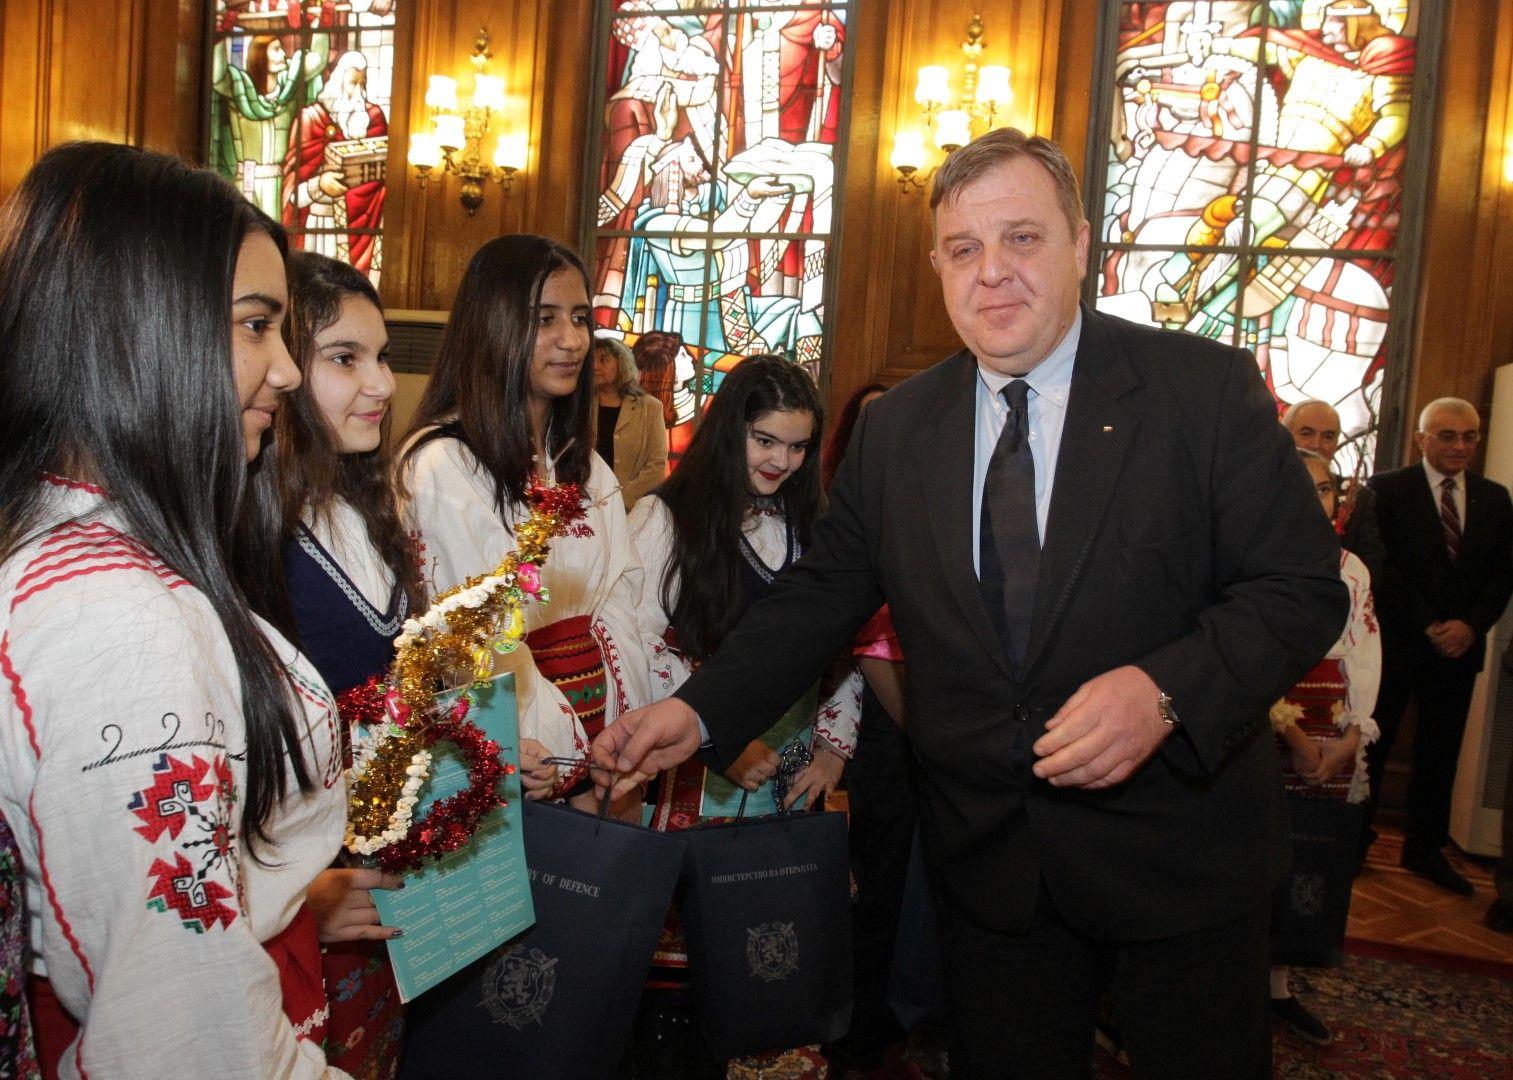 Ромски деца сурвакаха министъра